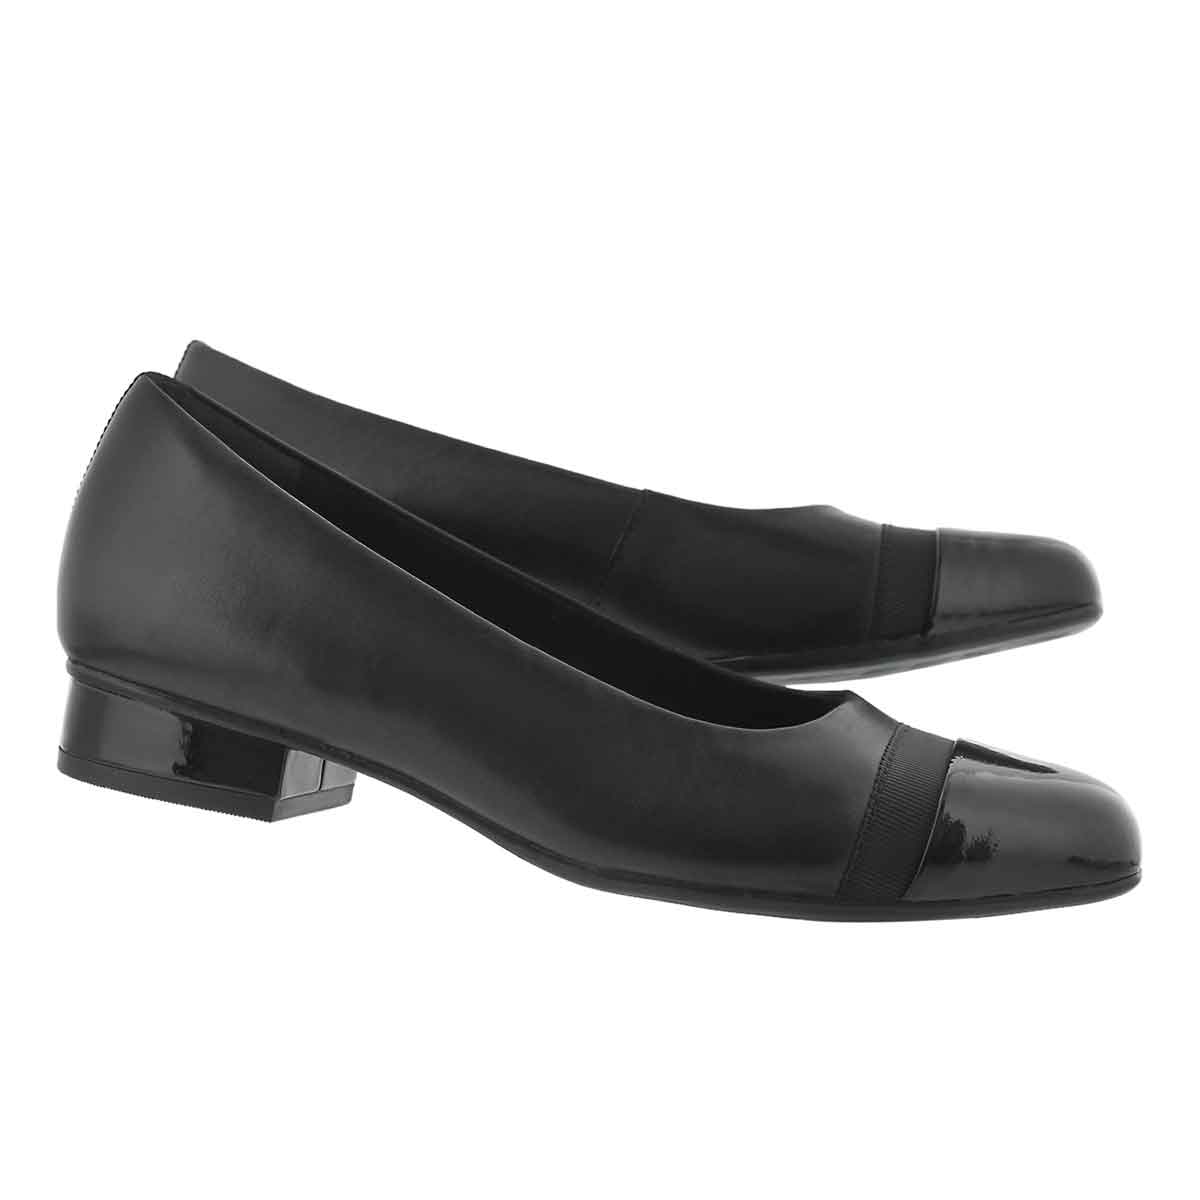 Lds Keesha Rosa blk dress heel